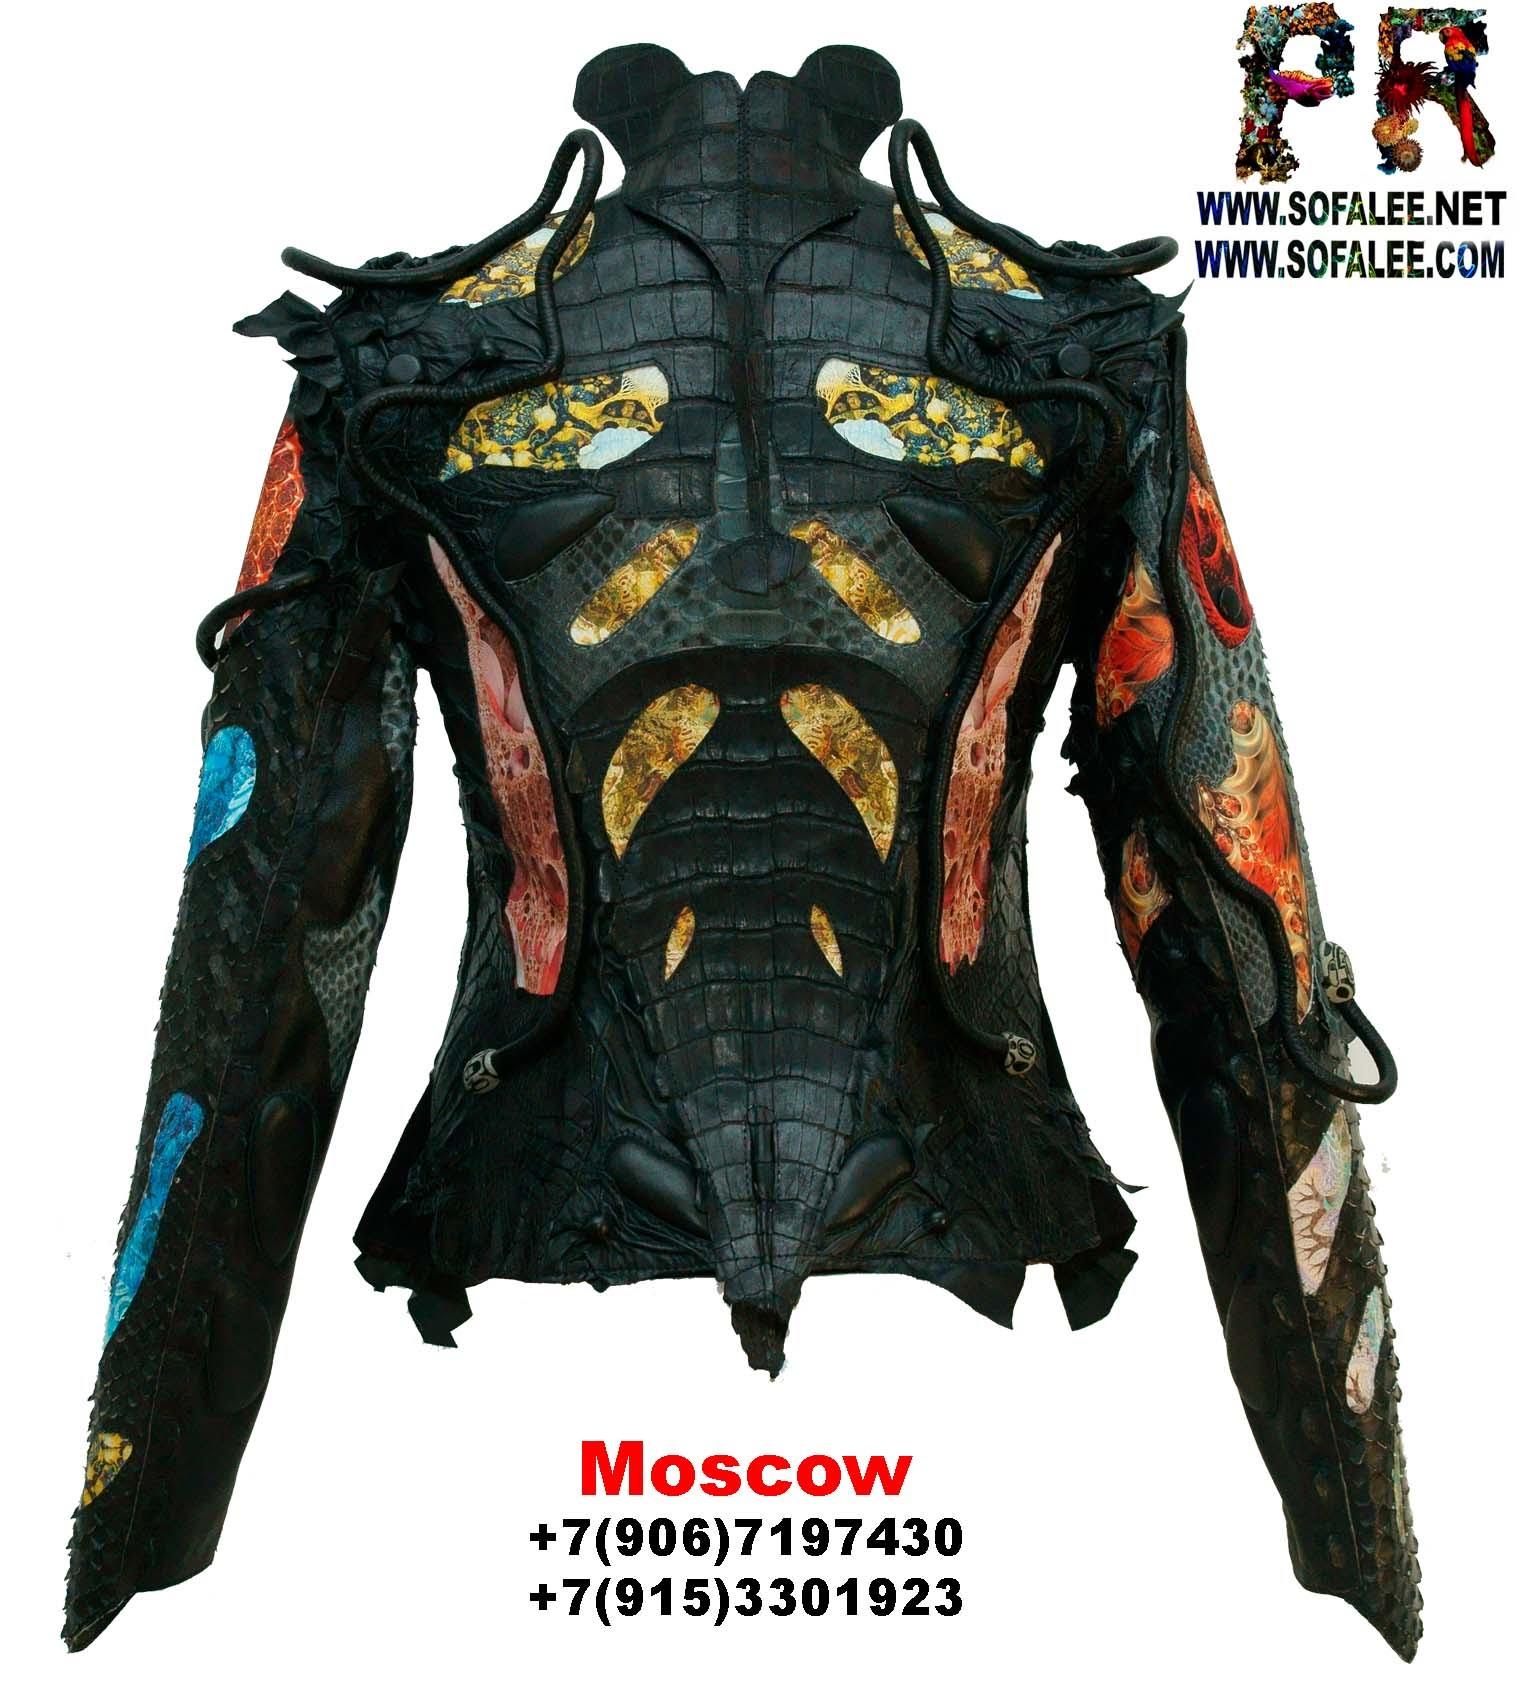 https://sites.google.com/a/sofalee.com/sofalee-genuine-leather-jackets/clothing-from-a-crocodile-python/no183-kurtka-zenskaa-iz-naturalnoj-kozi-krokodila-pitona-astridot/%D0%AD%D0%BA%D1%81%D0%BA%D0%BB%D1%8E%D0%B7%D0%B8%D0%B2%D0%BD%D0%B0%D1%8F%20%D0%BA%D1%83%D1%80%D1%82%D0%BA%D0%B0%20%D0%B8%D0%B7%20%D0%BA%D1%80%D0%BE%D0%BA%D0%BE%D0%B4%D0%B8%D0%BB%D0%BE%D0%B2%D0%BE%D0%B9%20%D0%BA%D0%BE%D0%B6%D0%B8%20%D0%B8%20%D0%BF%D0%B8%D1%82%D0%BE%D0%BD%D0%B0.jpg?attredirects=0